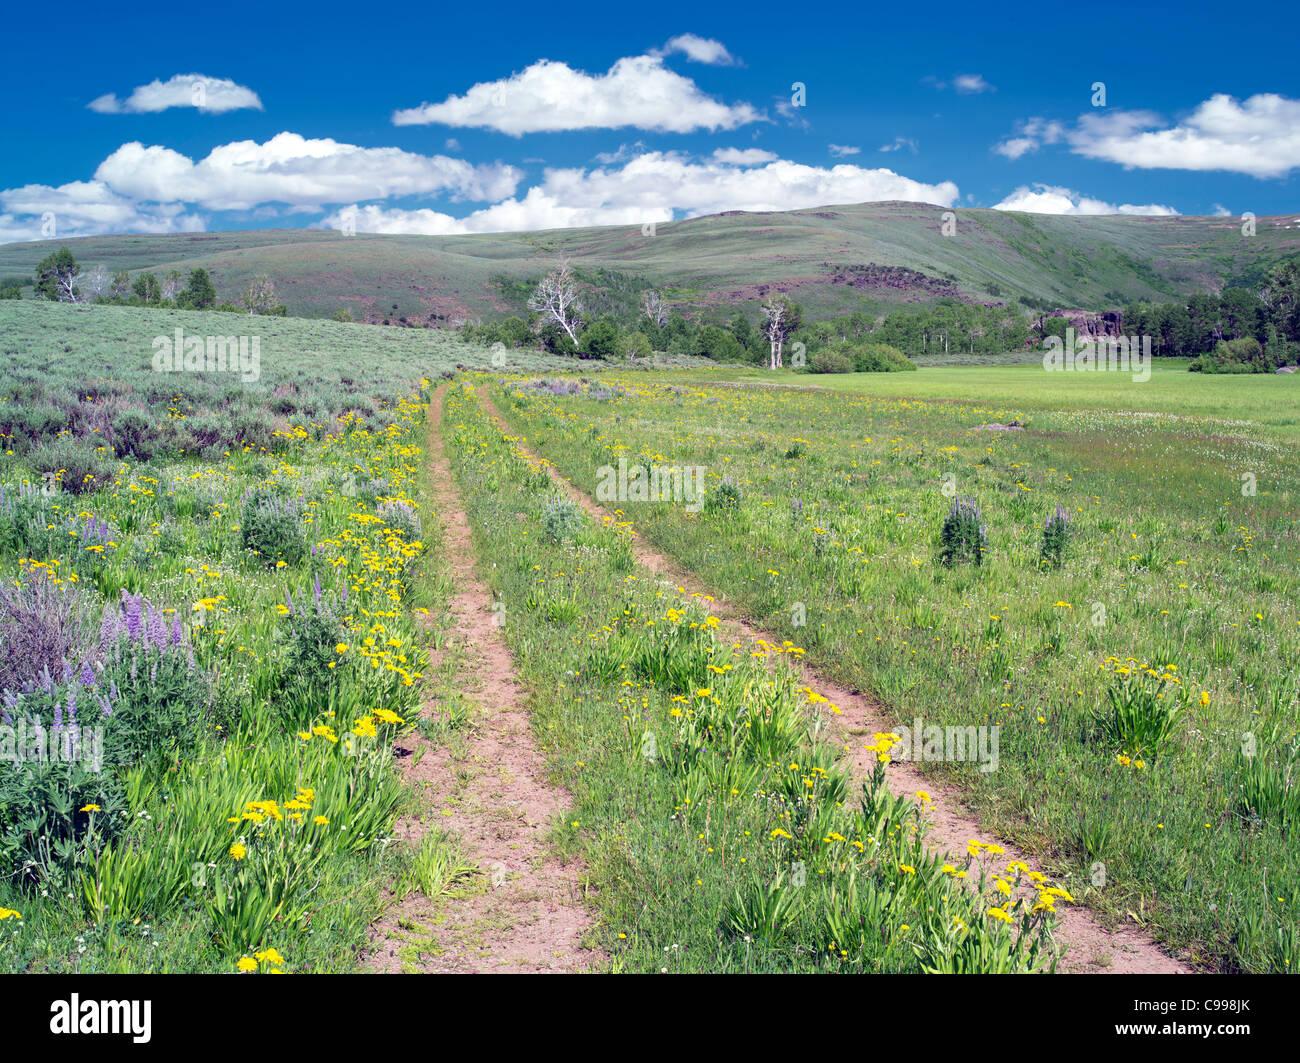 Road through wildflowers. Steen Mountain, Oregon - Stock Image